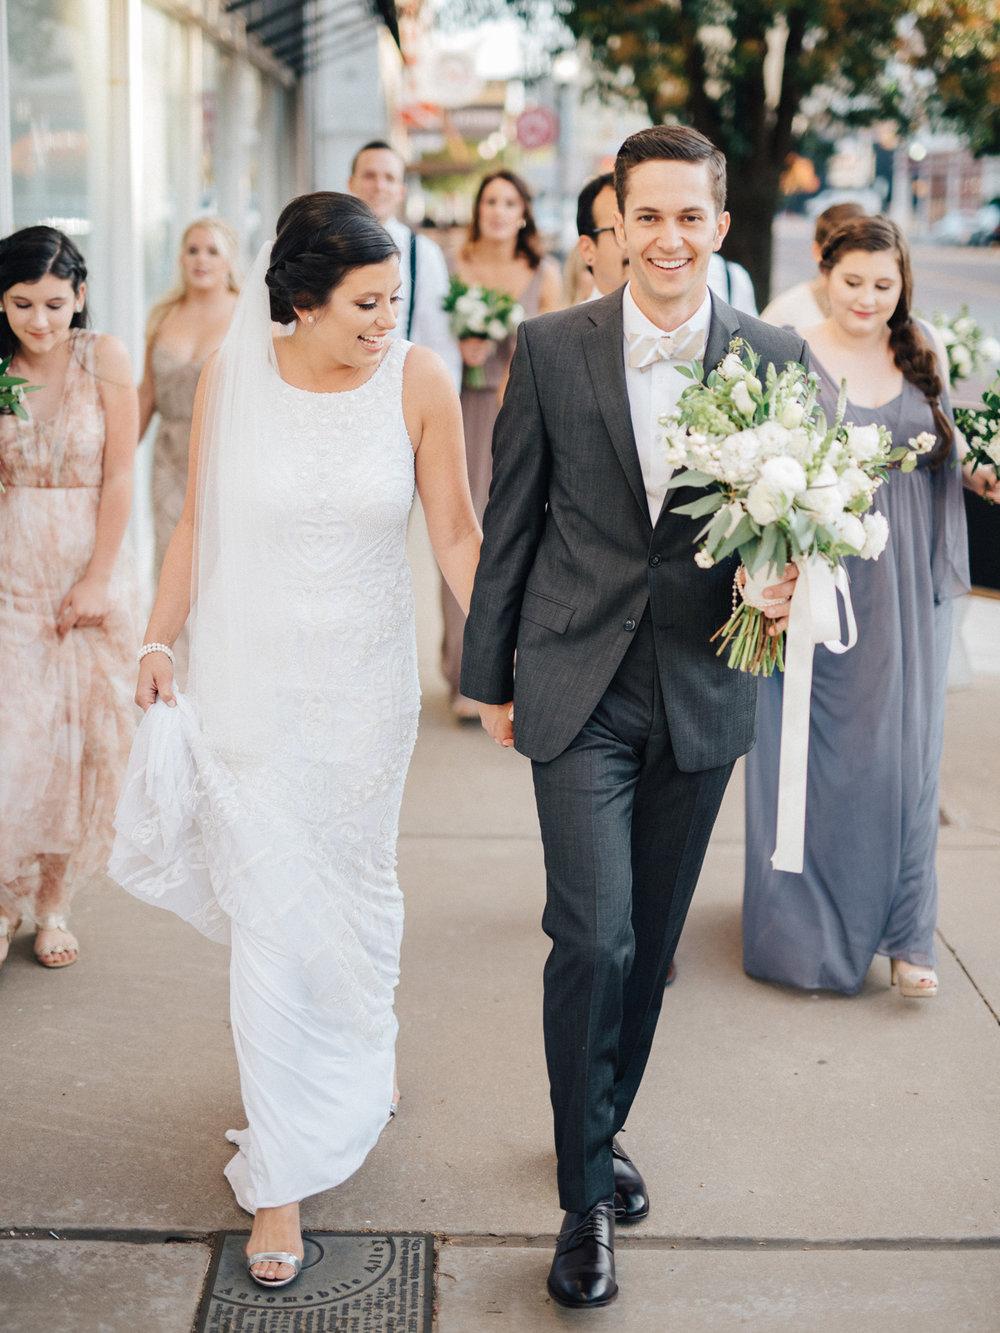 OKC rooftop wedding josh mccullock-6548.jpg